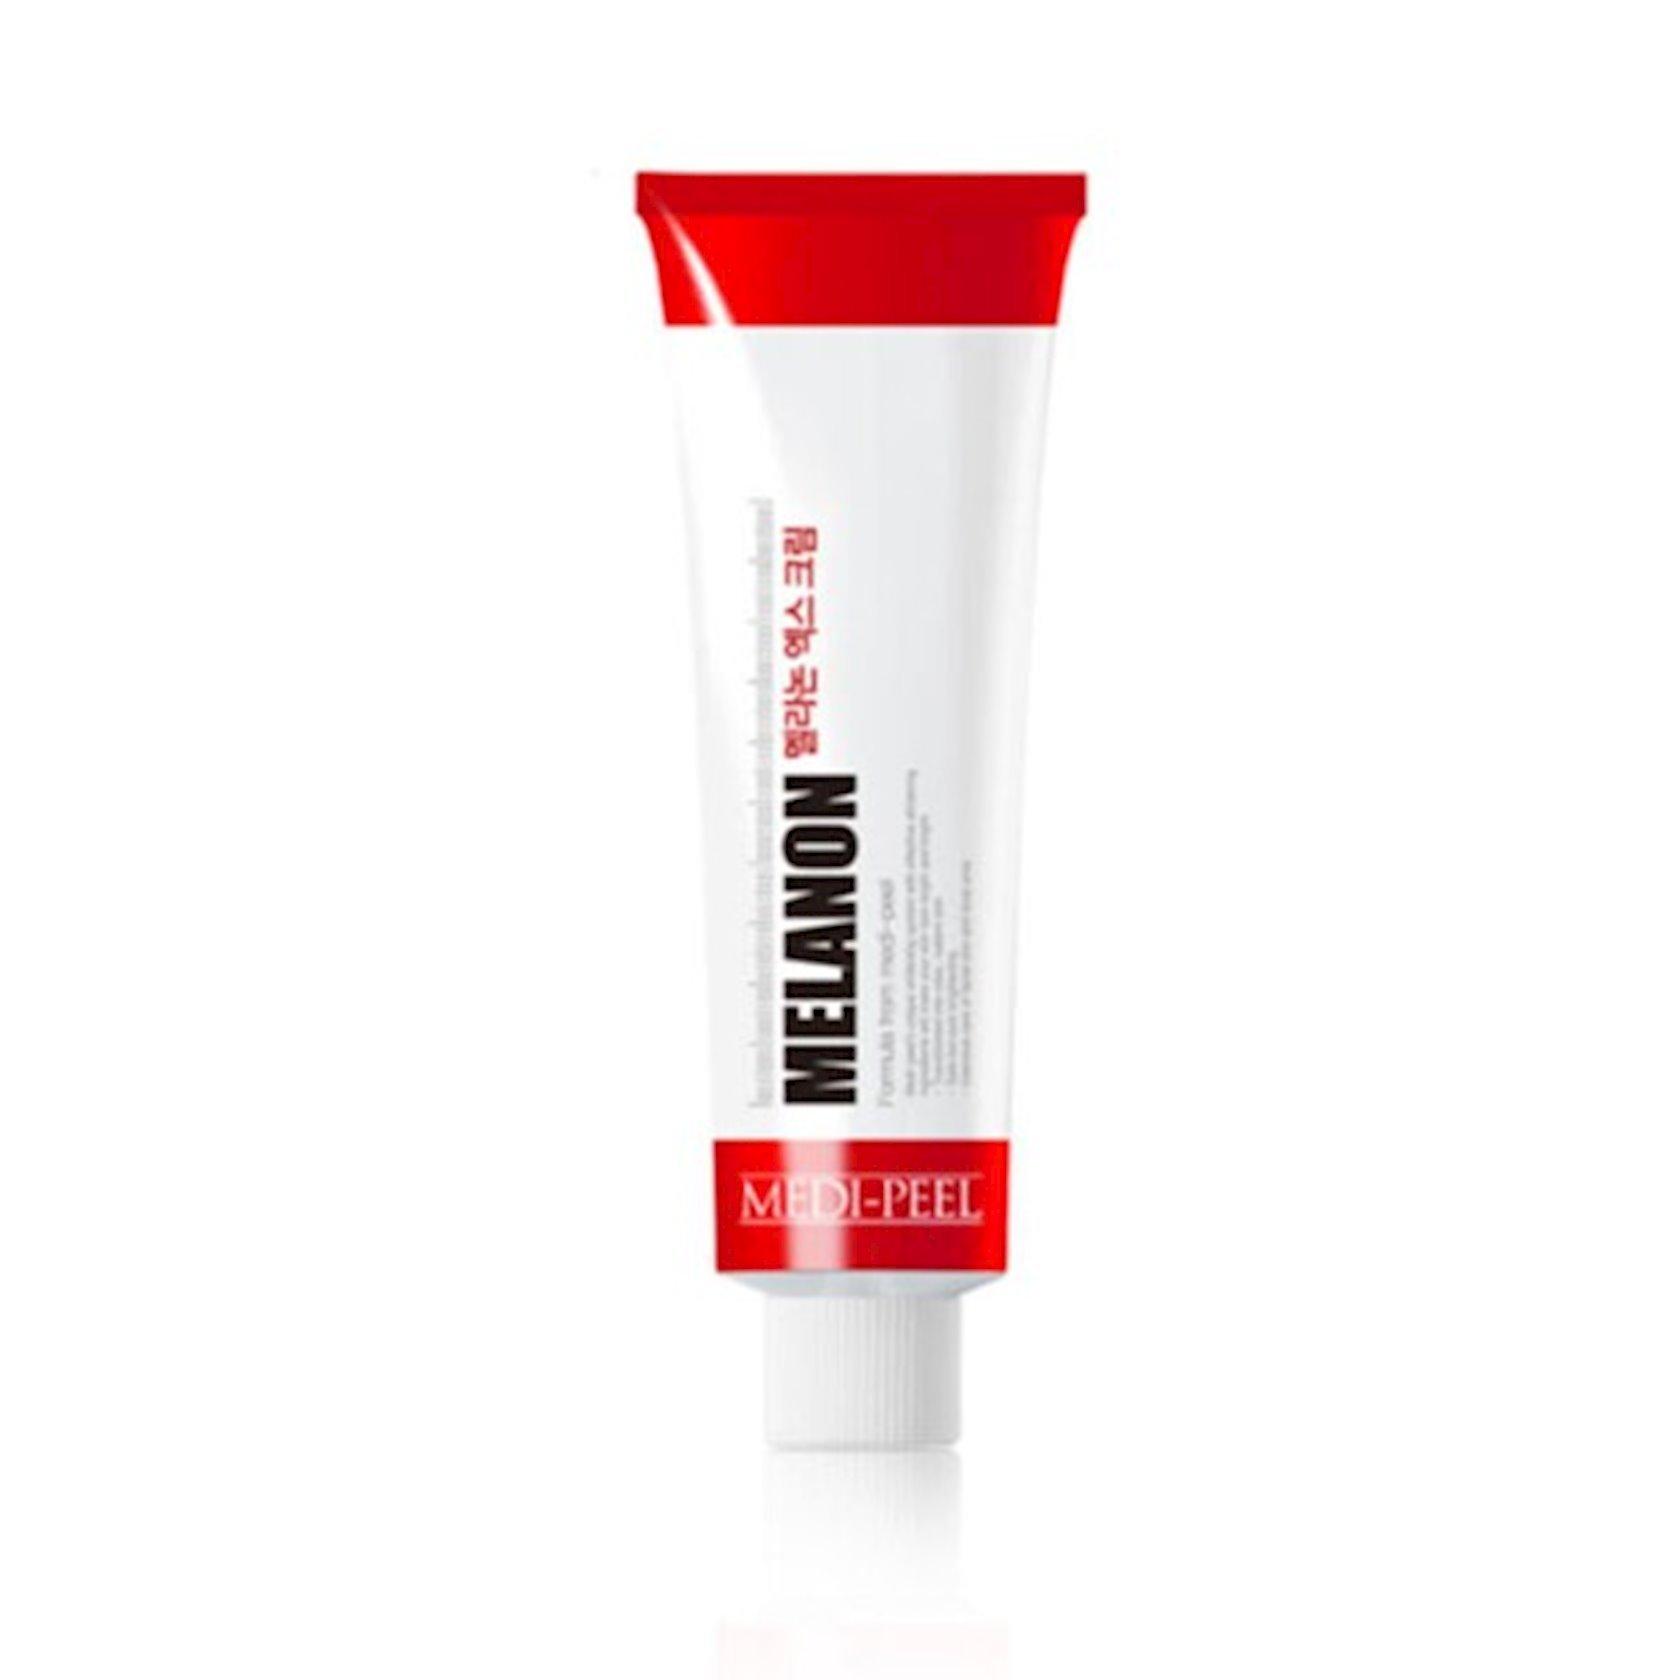 Üz üçün krem Medi-Peel Melanon X Cream 30 ml